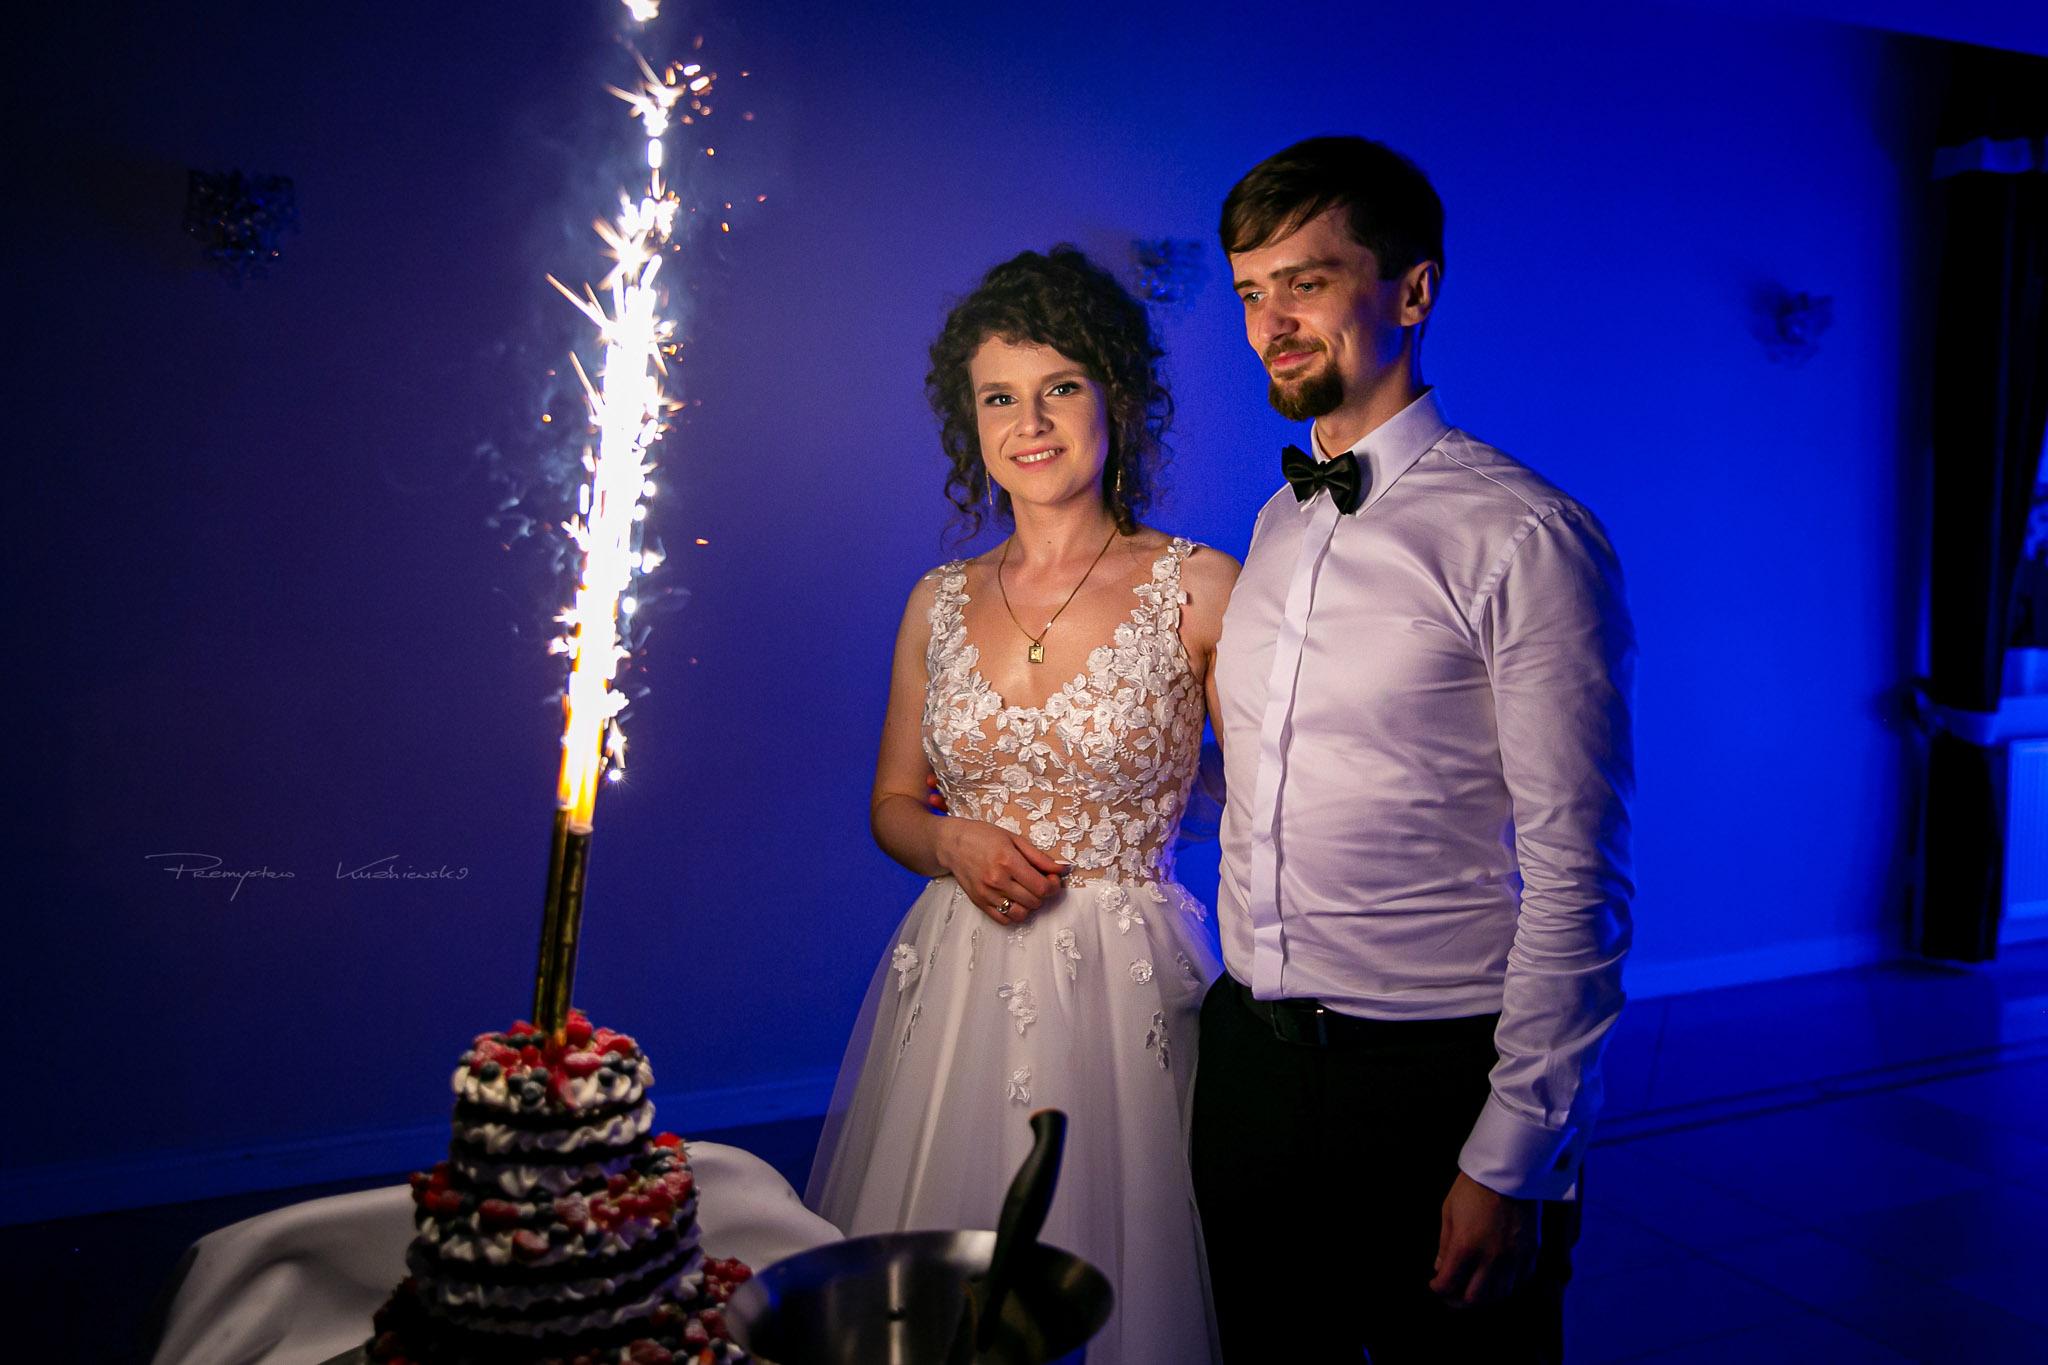 Marta i Daniel tort weselny fotografia slubna empiriafoto pmk